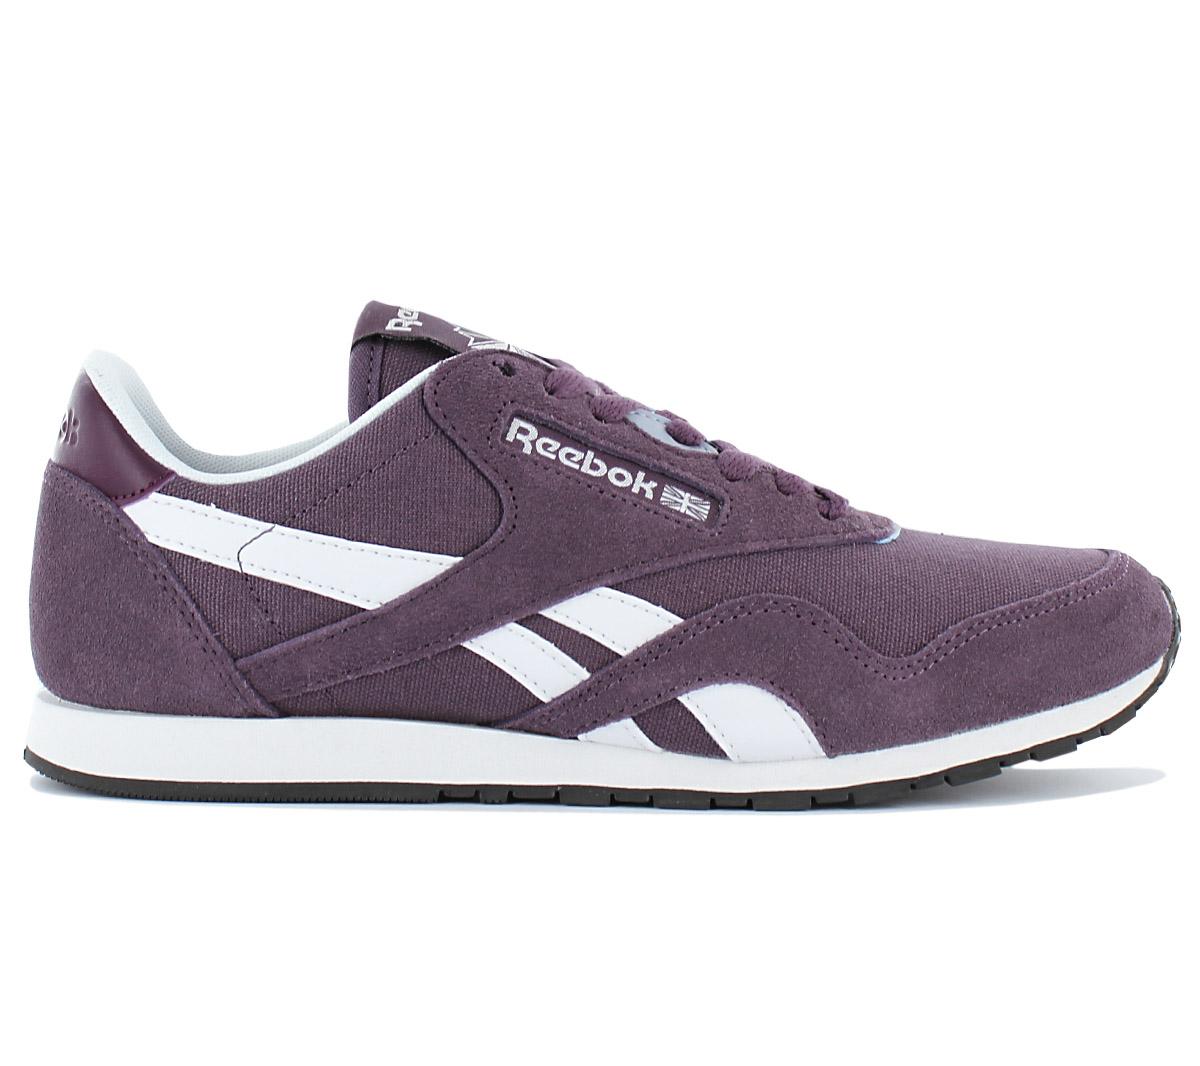 Details about Reebok Classic Nylon Slim Cv Women's Sneaker Shoes Purple Trainers Retro BD1786